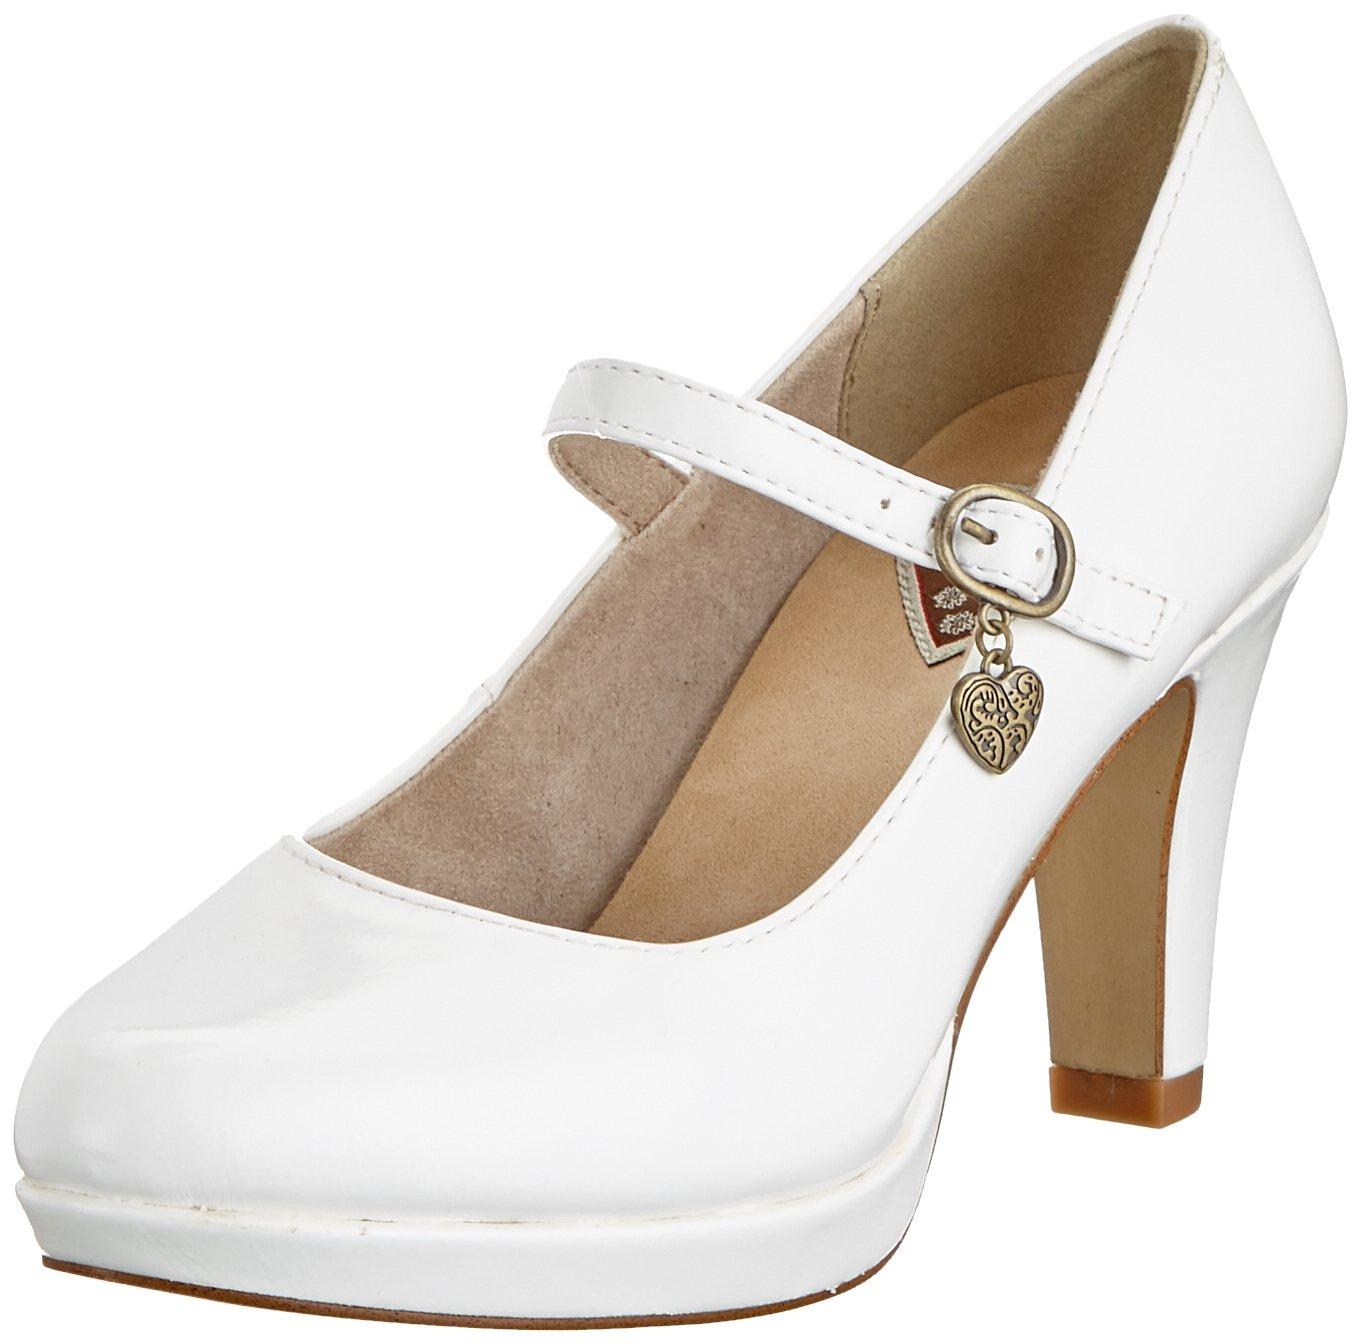 s.Oliver 24400-31, Zapatos de Tacón para Mujer 41 EU Blanco (White Patent 123)